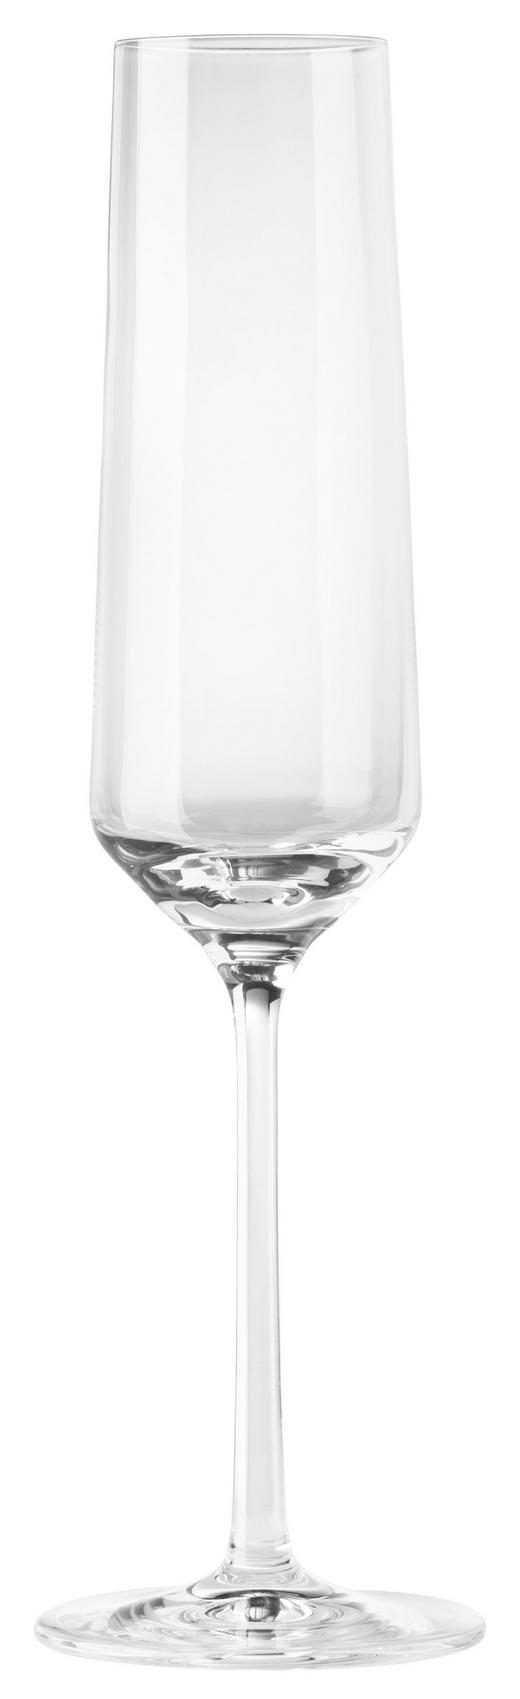 SEKTGLAS - Klar, Basics, Glas (0,7/  25,2cm) - SCHOTT ZWIESEL